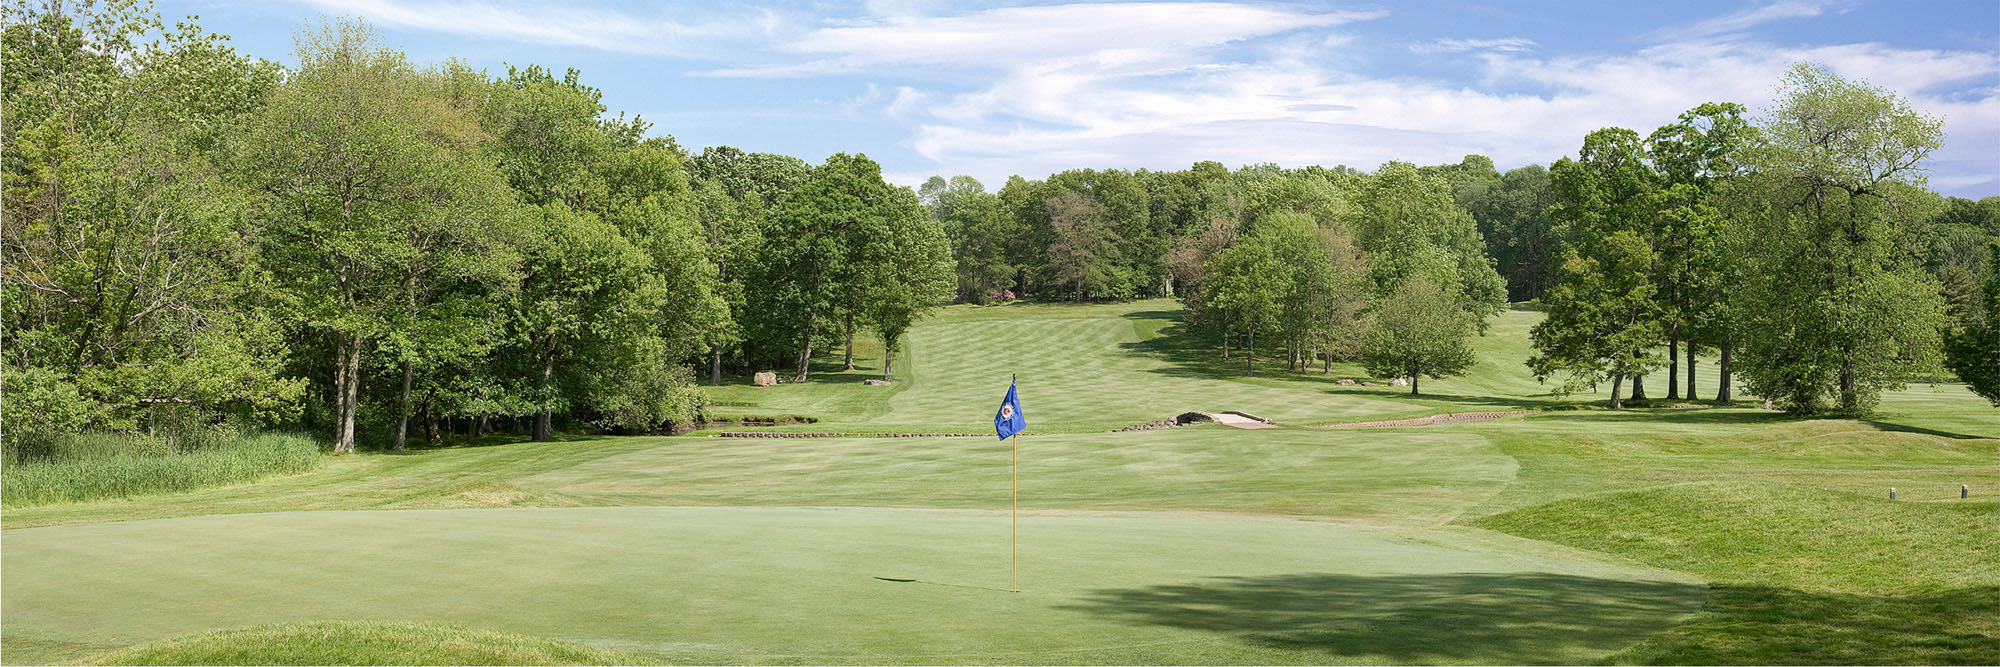 Golf Course Image - Montclair No. 3